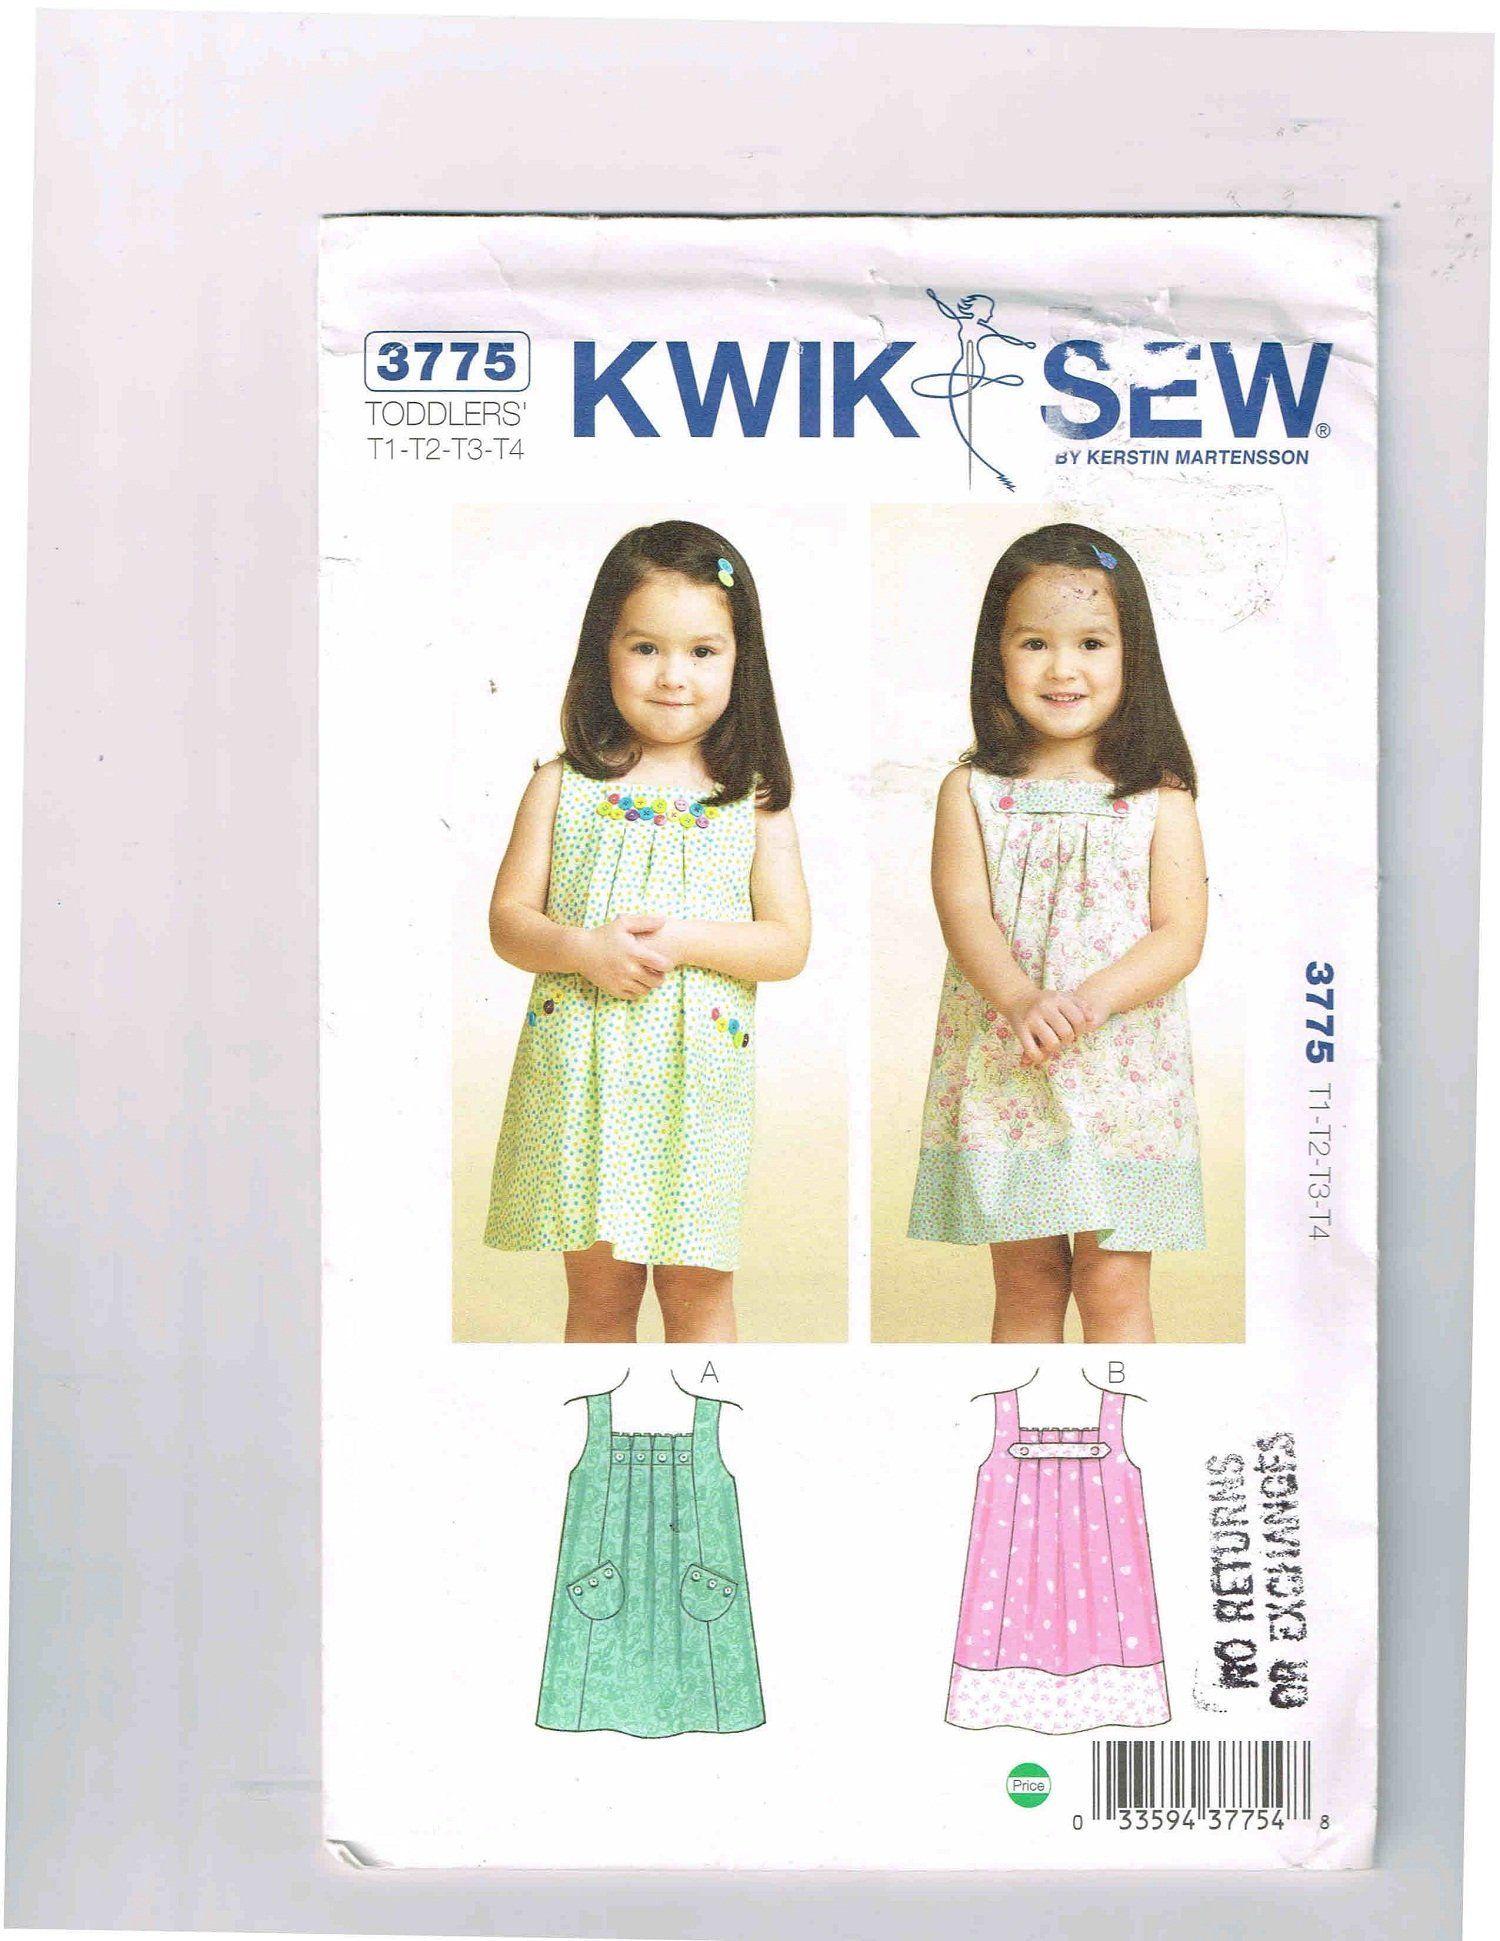 2010 Sealed, Uncut Toddler\'s Dress Pattern, Kwik Sew #3775, Sizes T1 ...